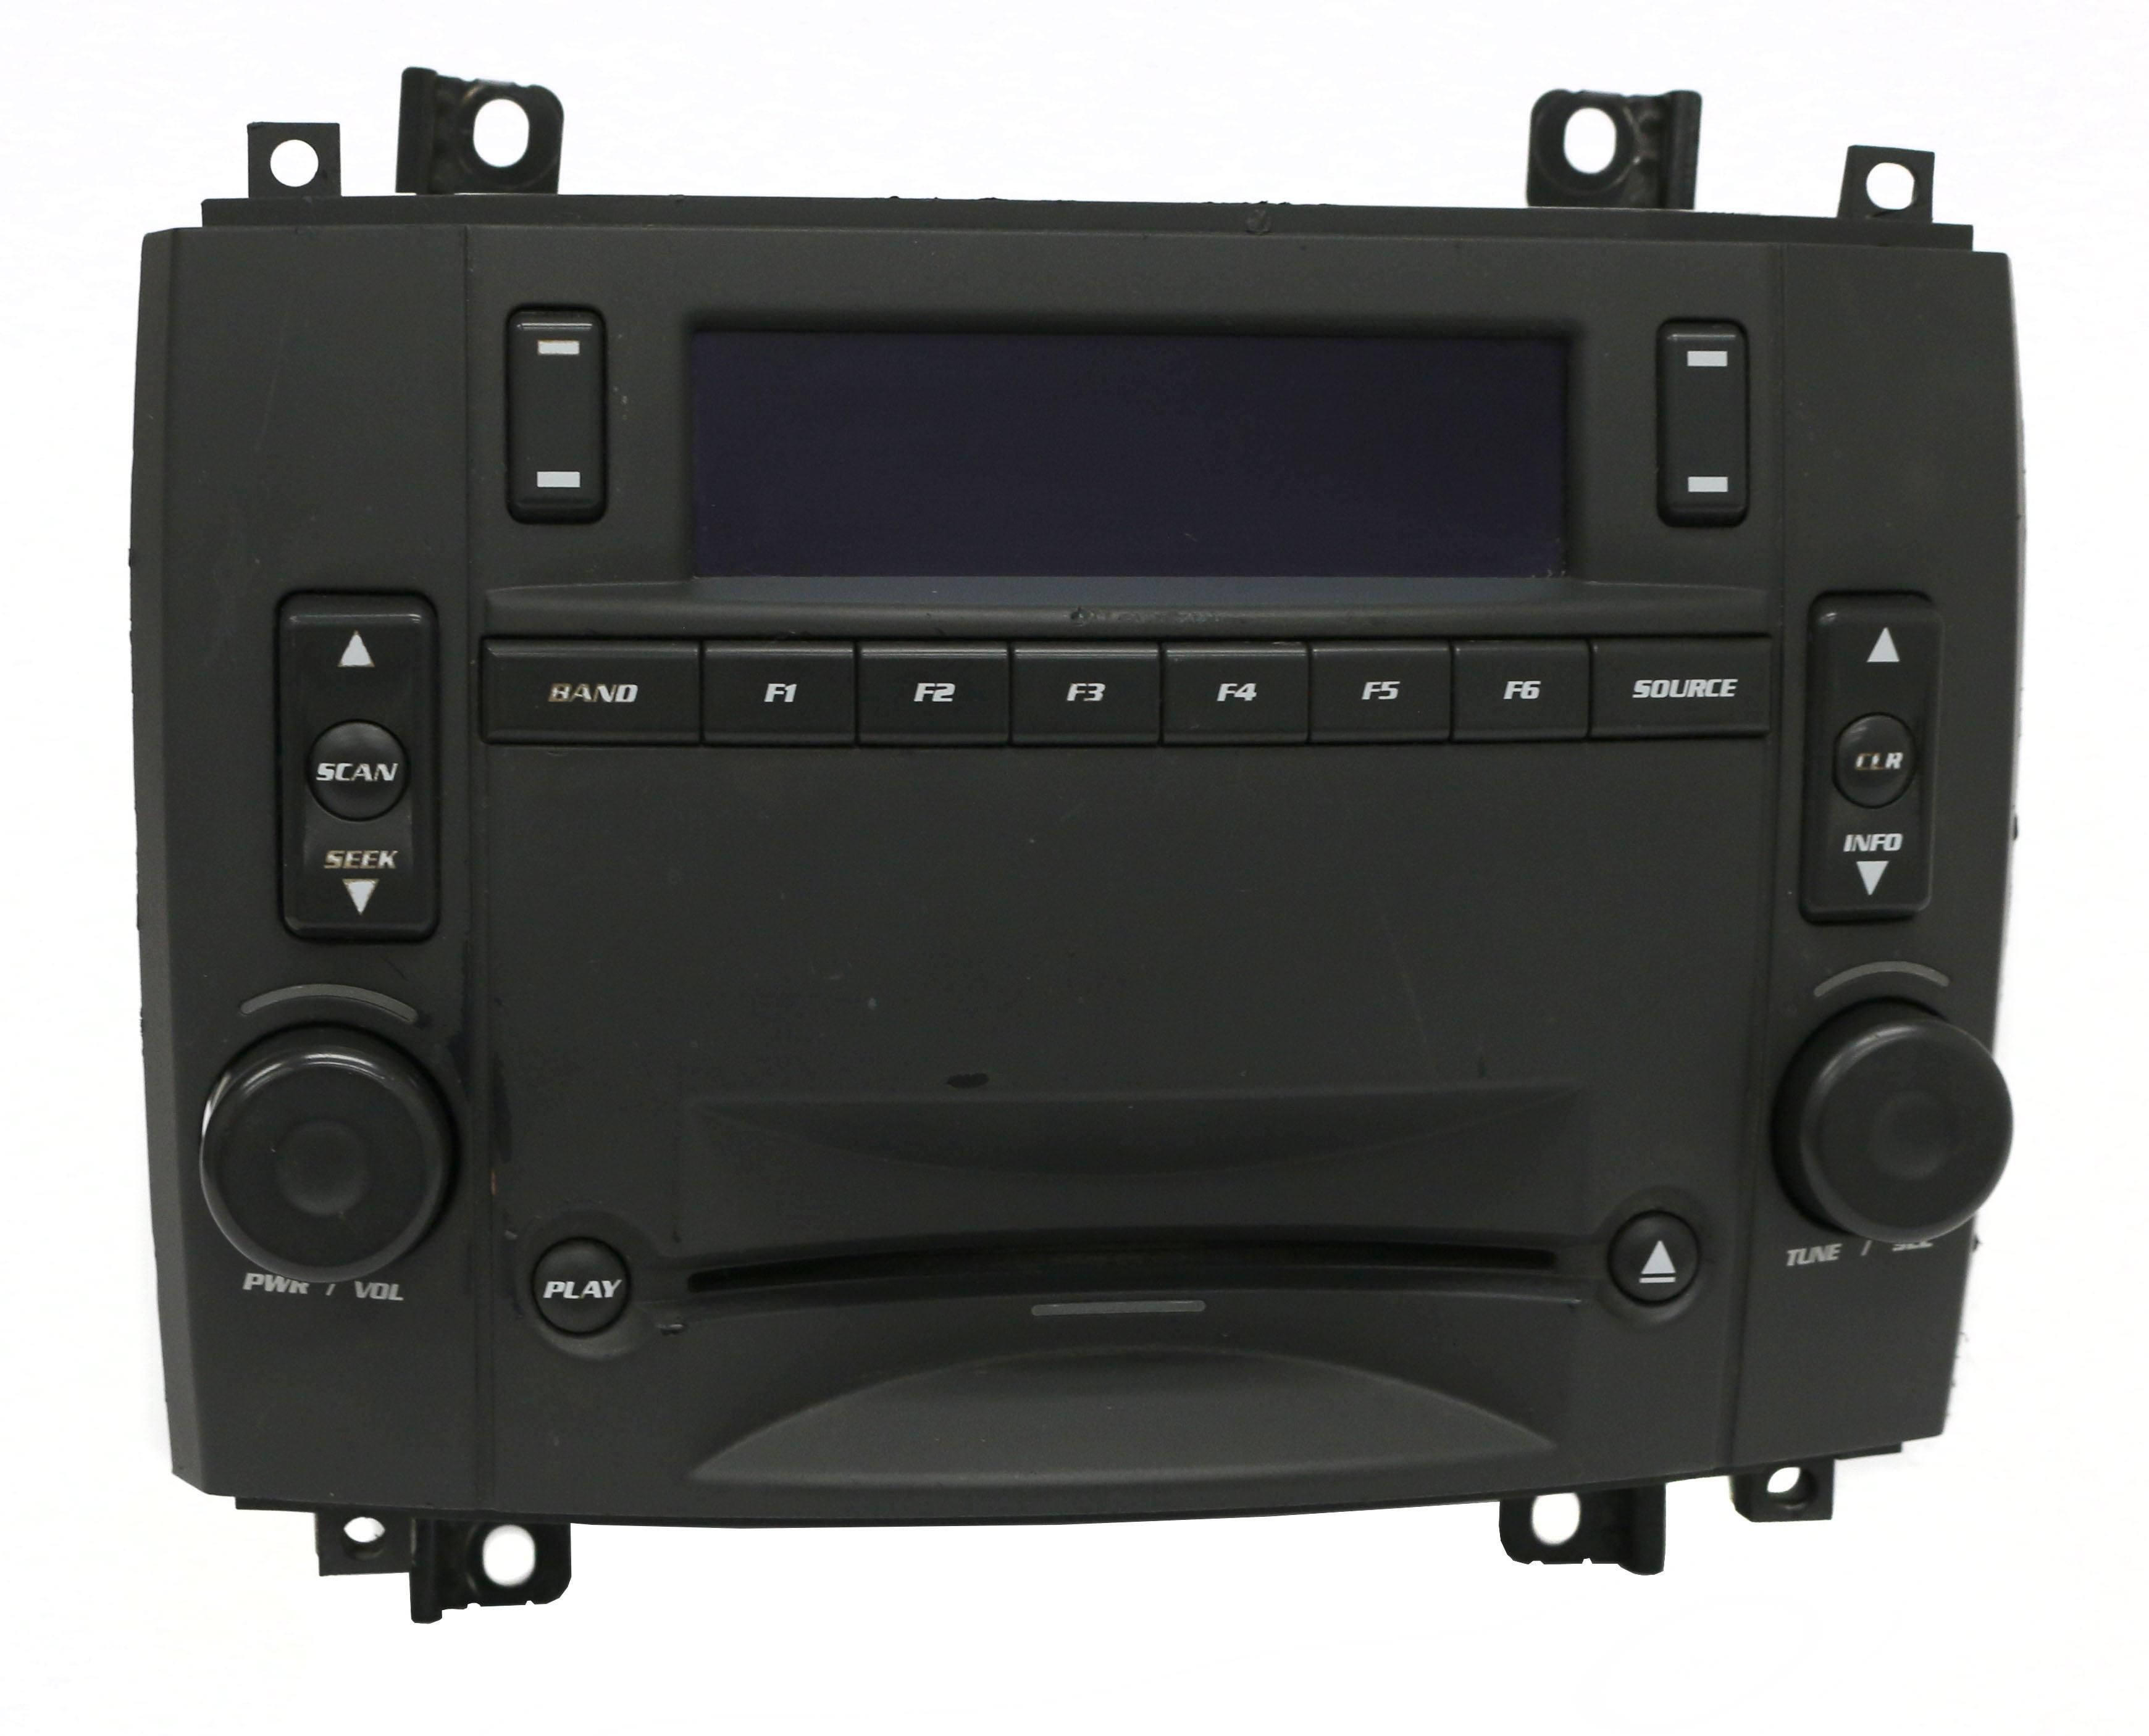 2005-07 Cadillac CTS Radio AM FM CD Cassette Player PN 25753338 Option Code U2R Refurbished by Cadillac